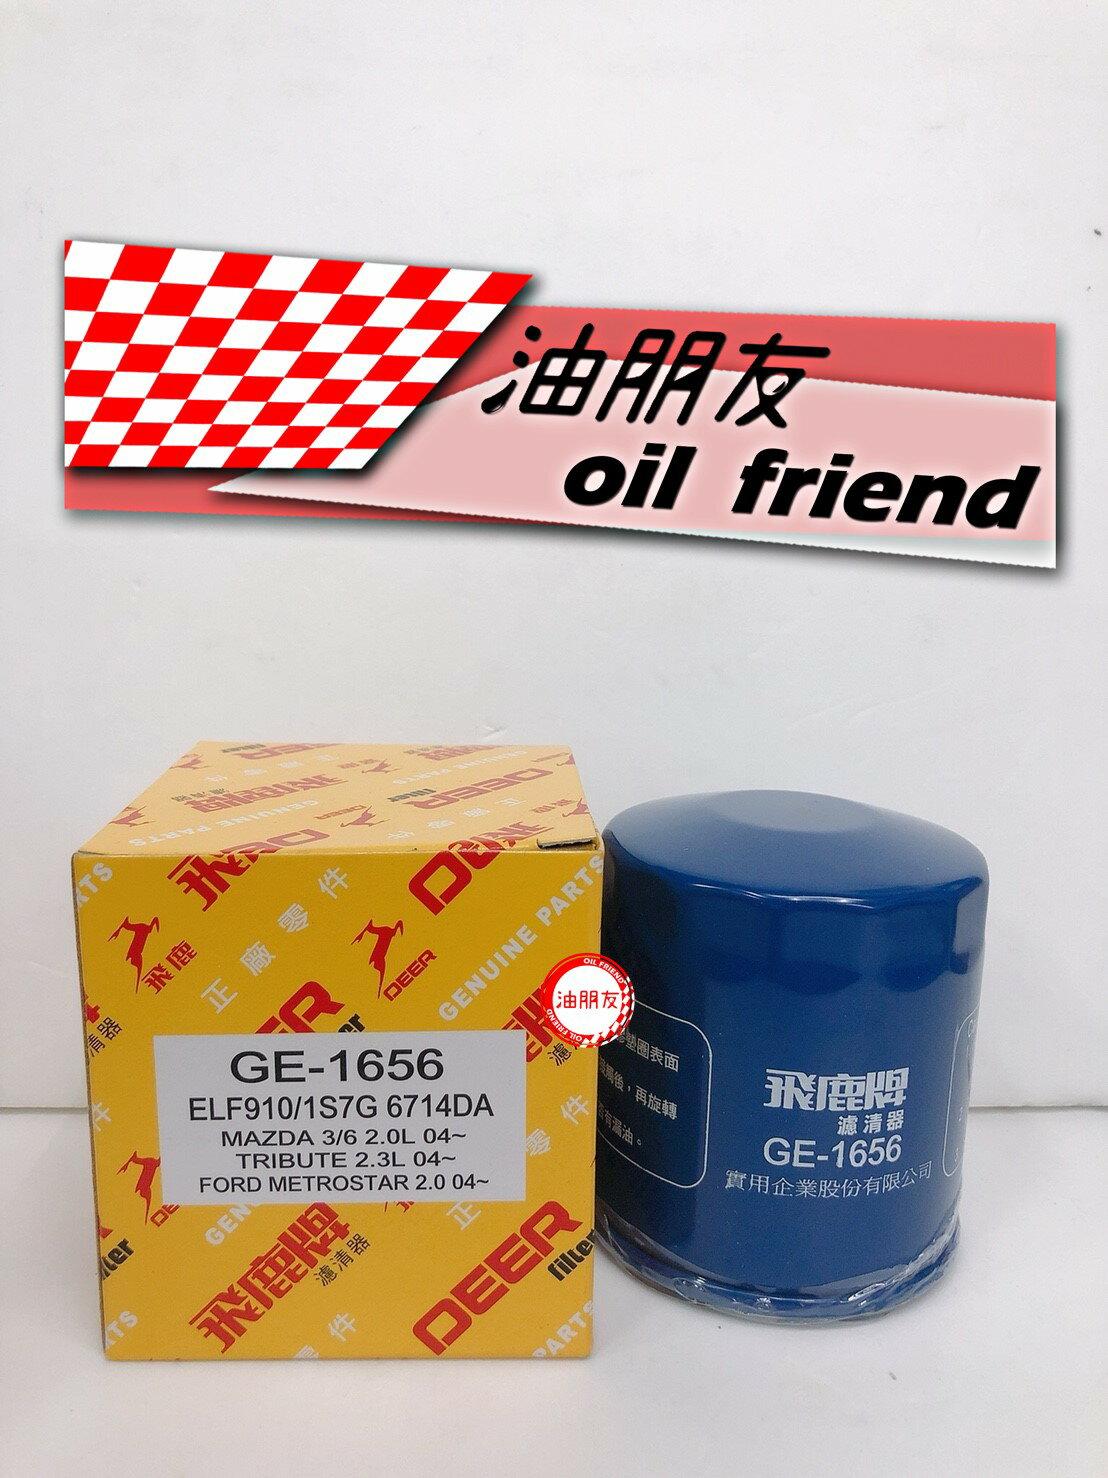 -油朋友-  福特 FORD FOCUS 04-08 1.8 2.0 GE-1656 GE1656 飛鹿 機油芯 機油心